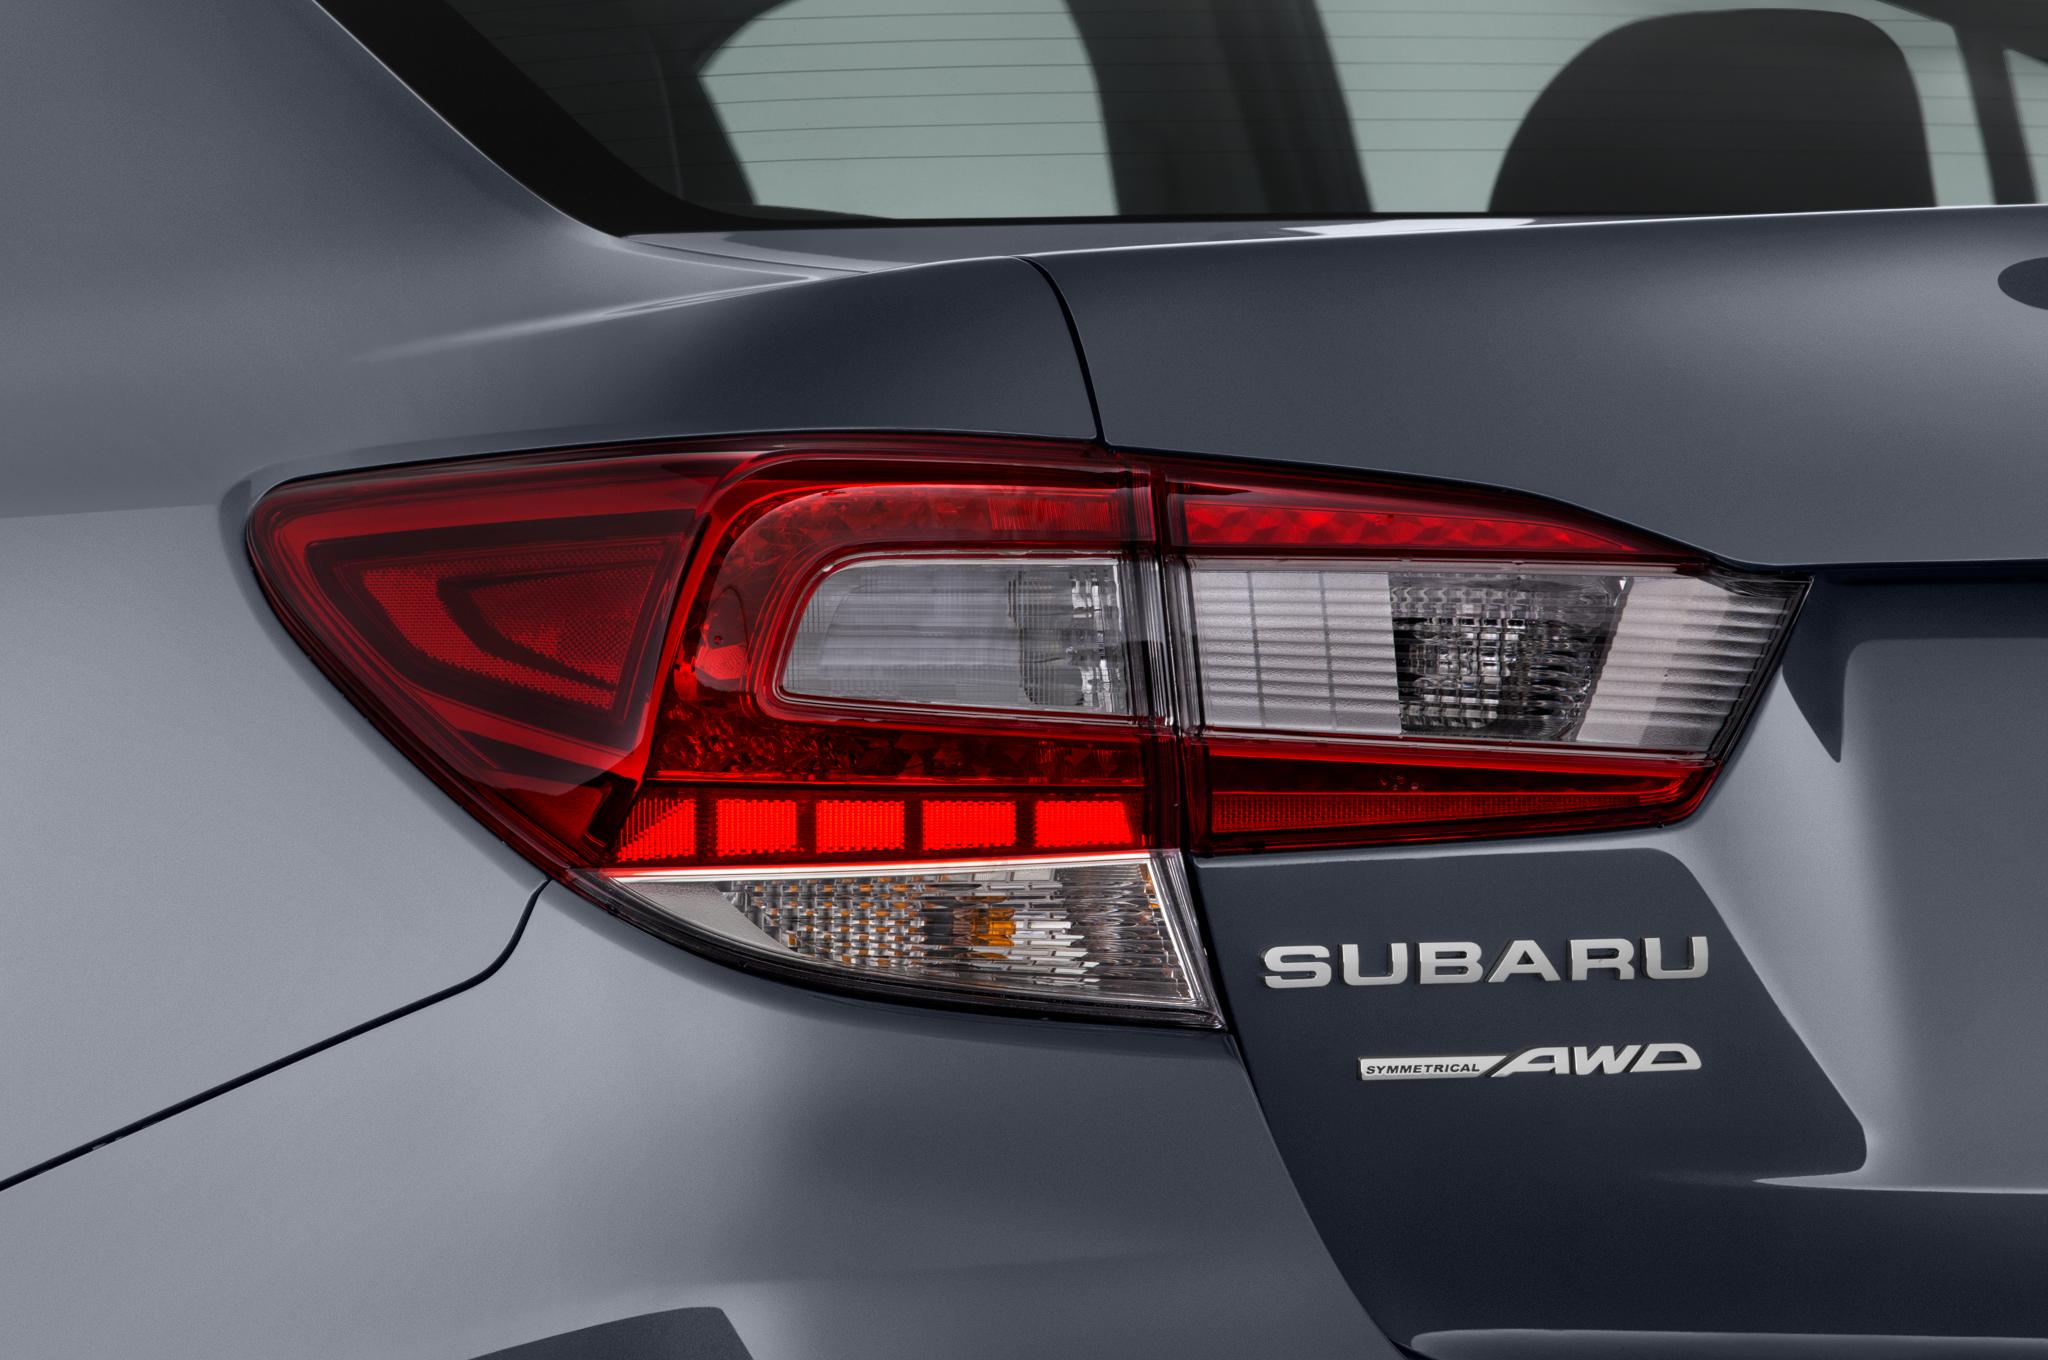 2017 Subaru Impreza Hatchback Spied with Sportier Design